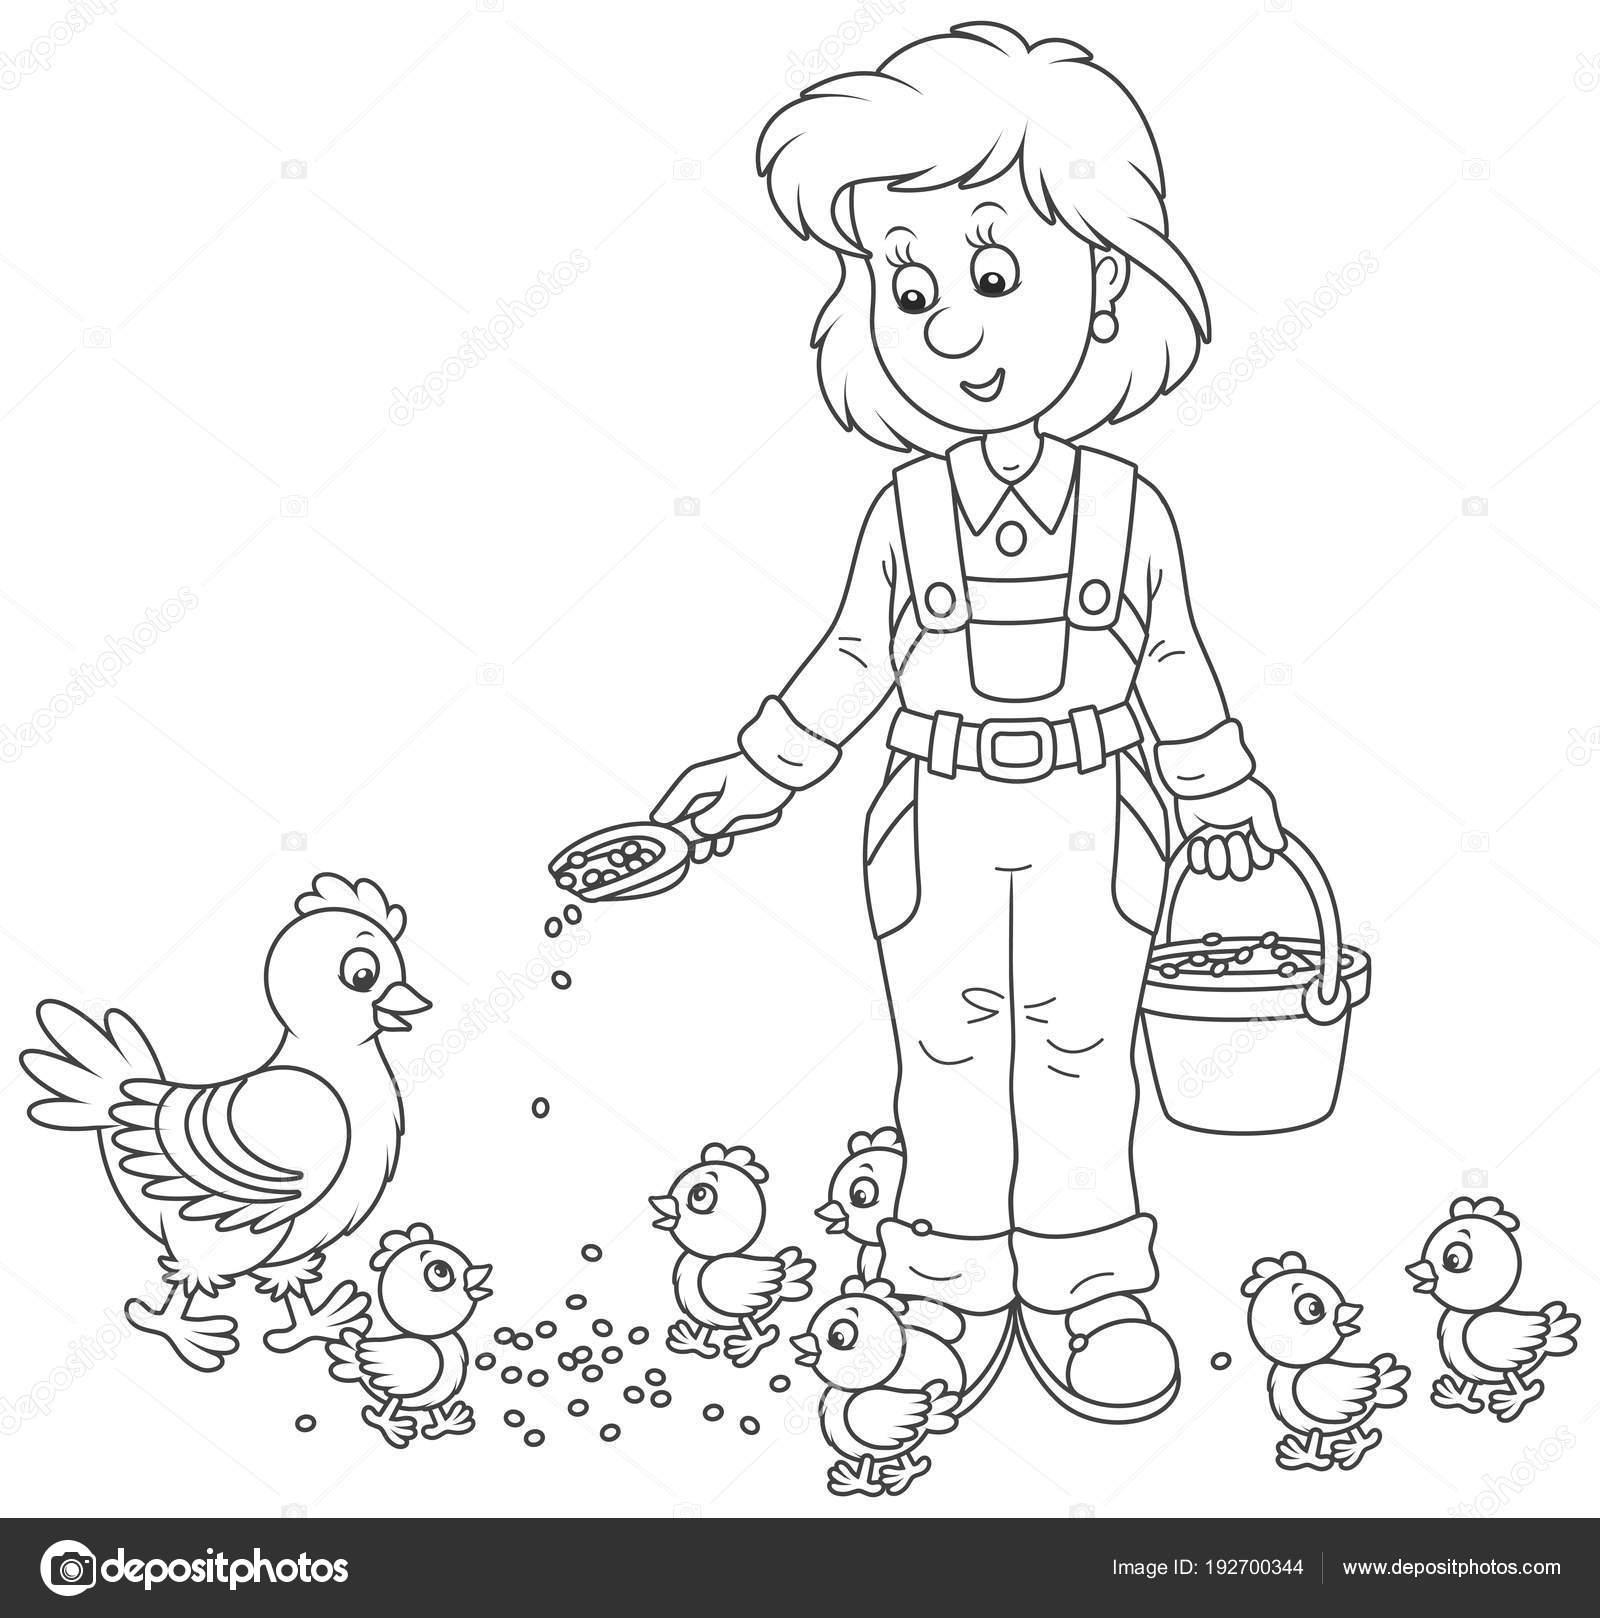 Dost Gülümseyen Kümes Hayvanları Kadın Onun Tavuk Küçük Civciv Kümes